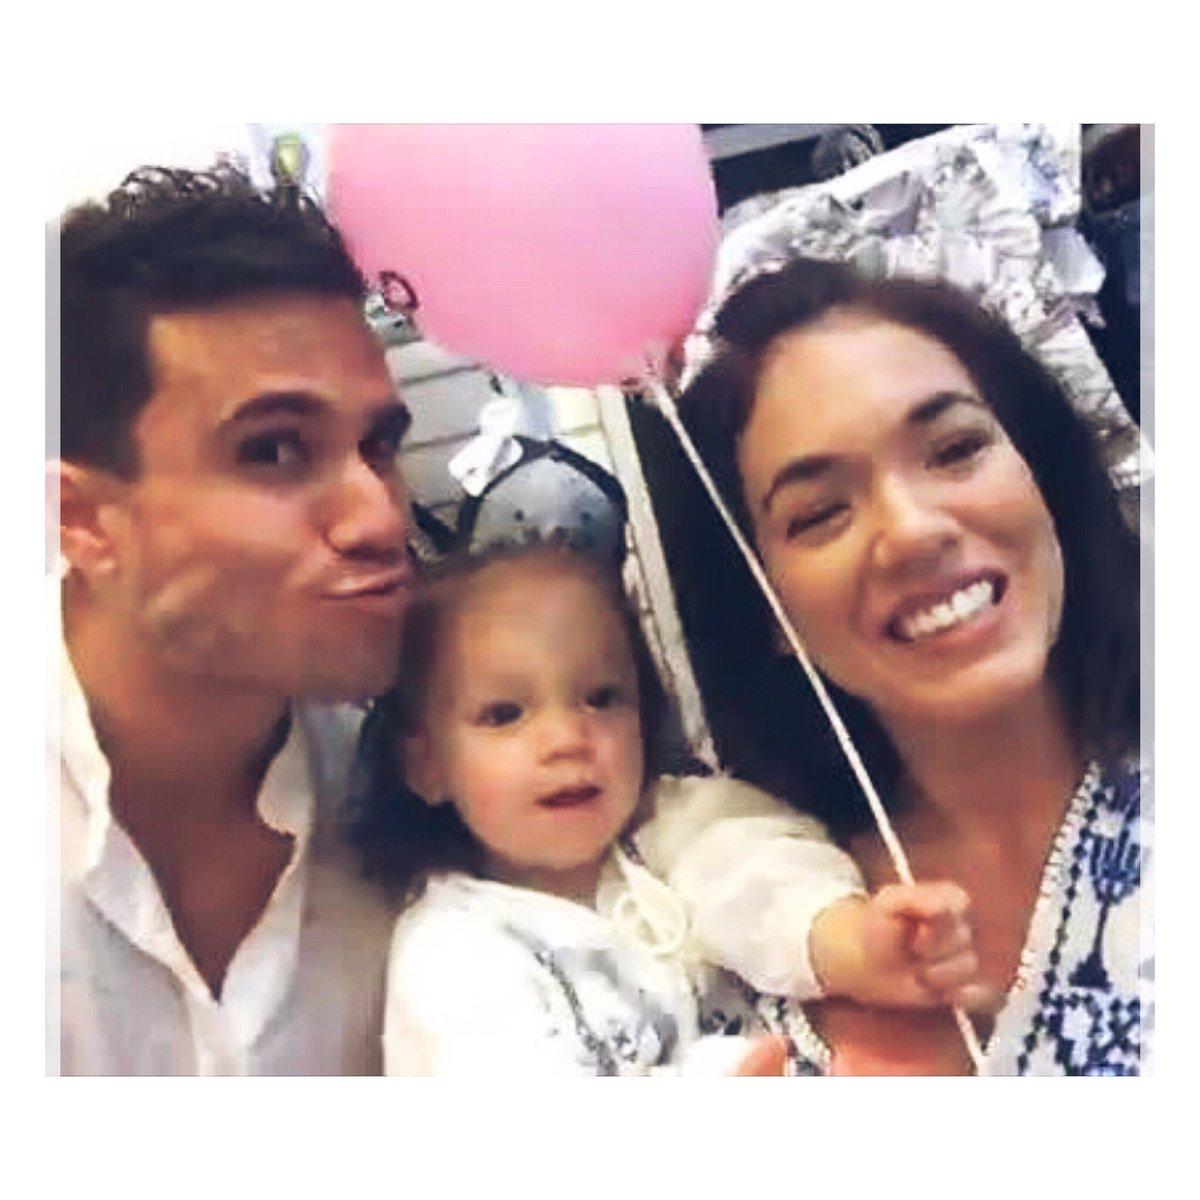 Que lindosss😍😍😍 #FamiliaFeliz ❤️👨👩👧 ht...